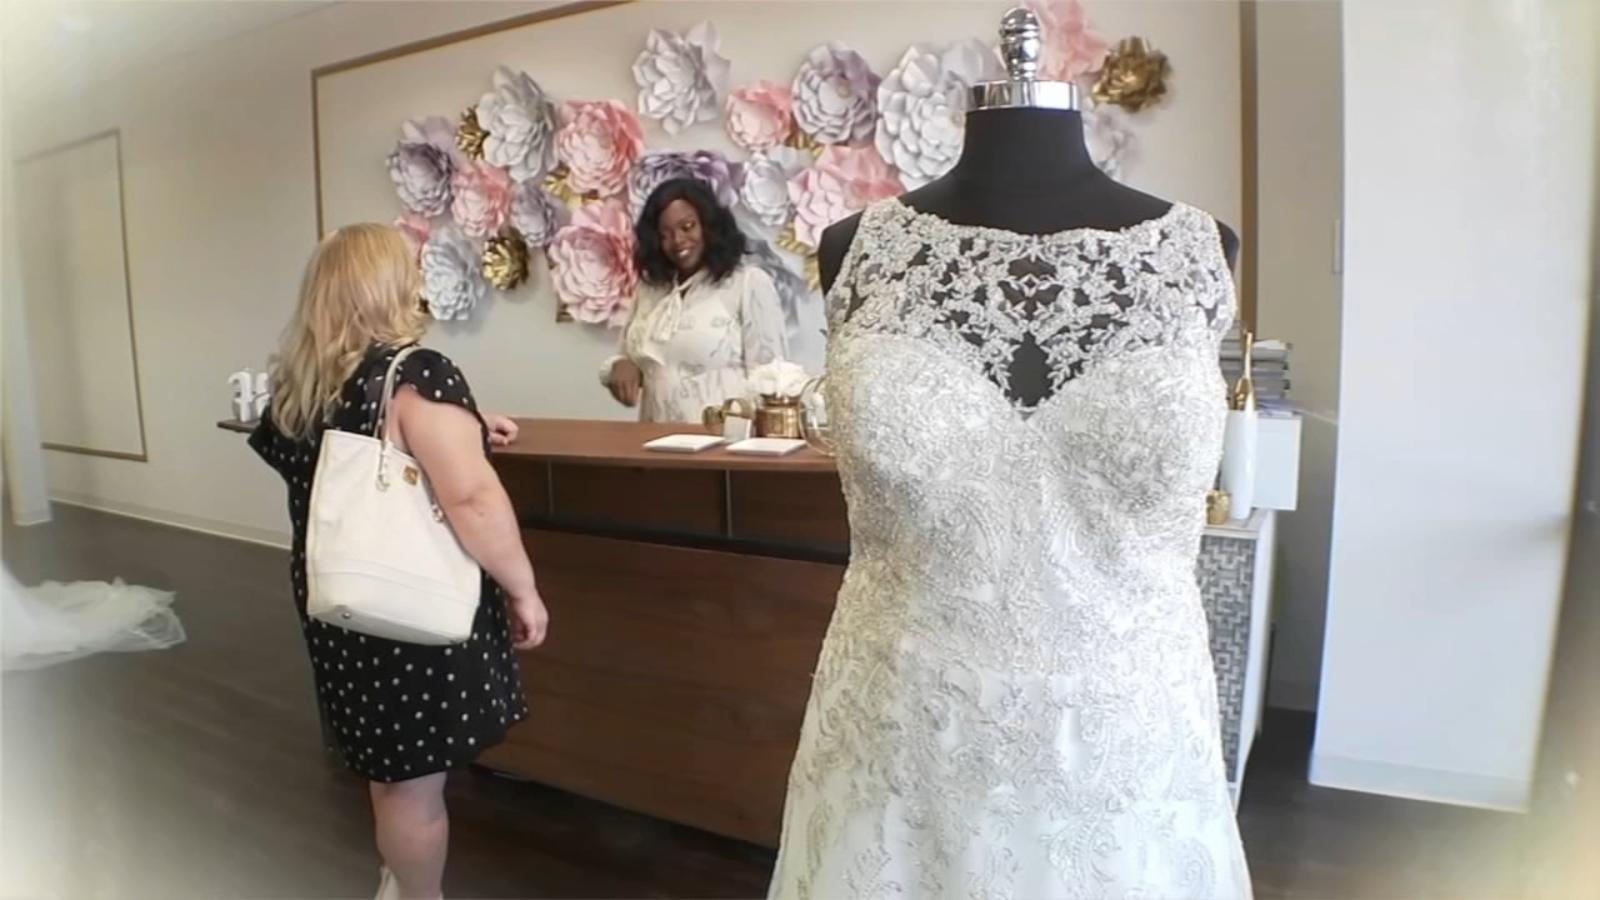 Houston Boutique Caters To Curvy Brides Abc13 Houston,Lily Allen Wedding Dress Dior